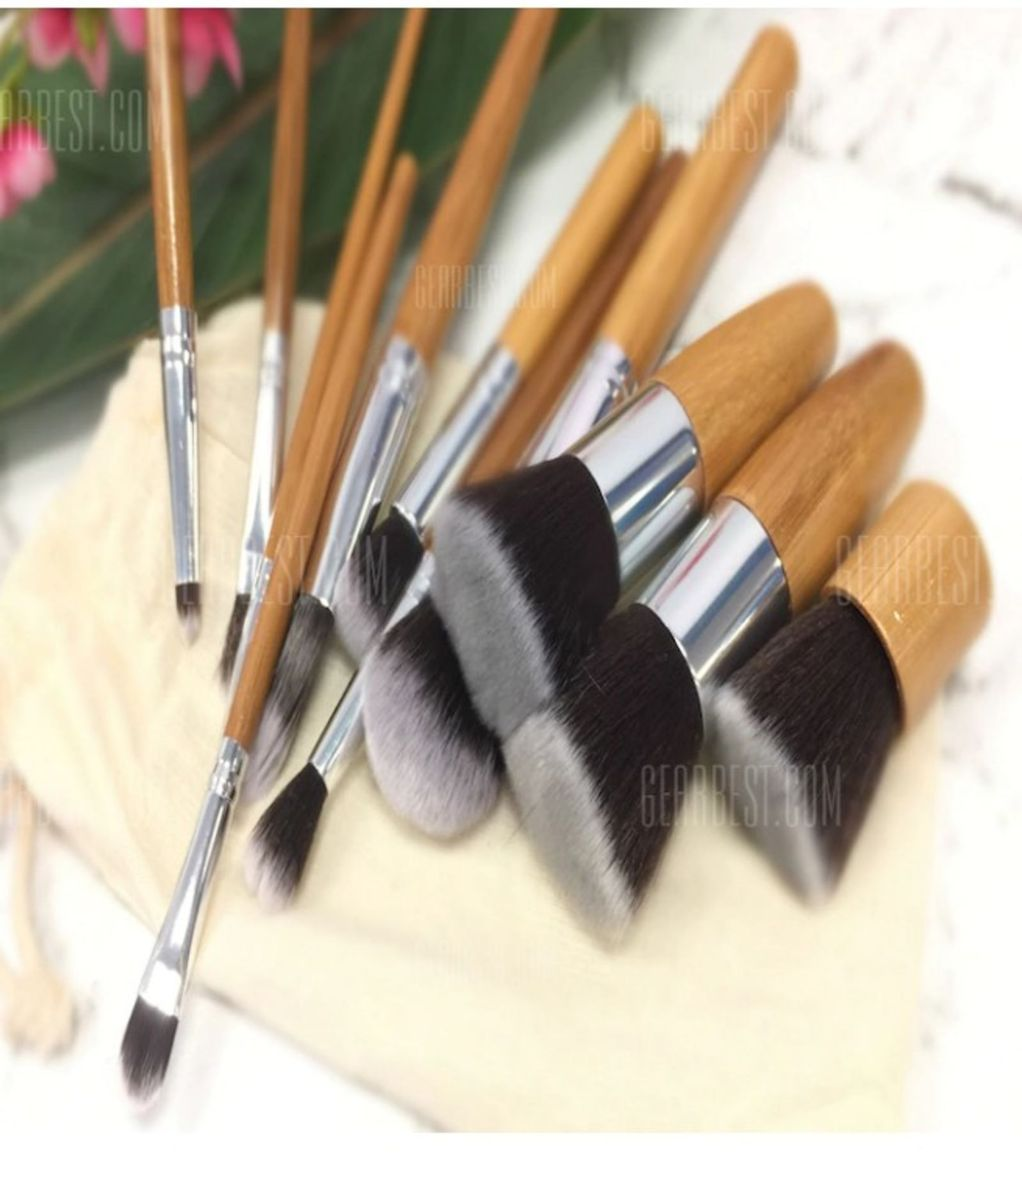 kit de pincéis com 11pcs - maquiagem sem marca